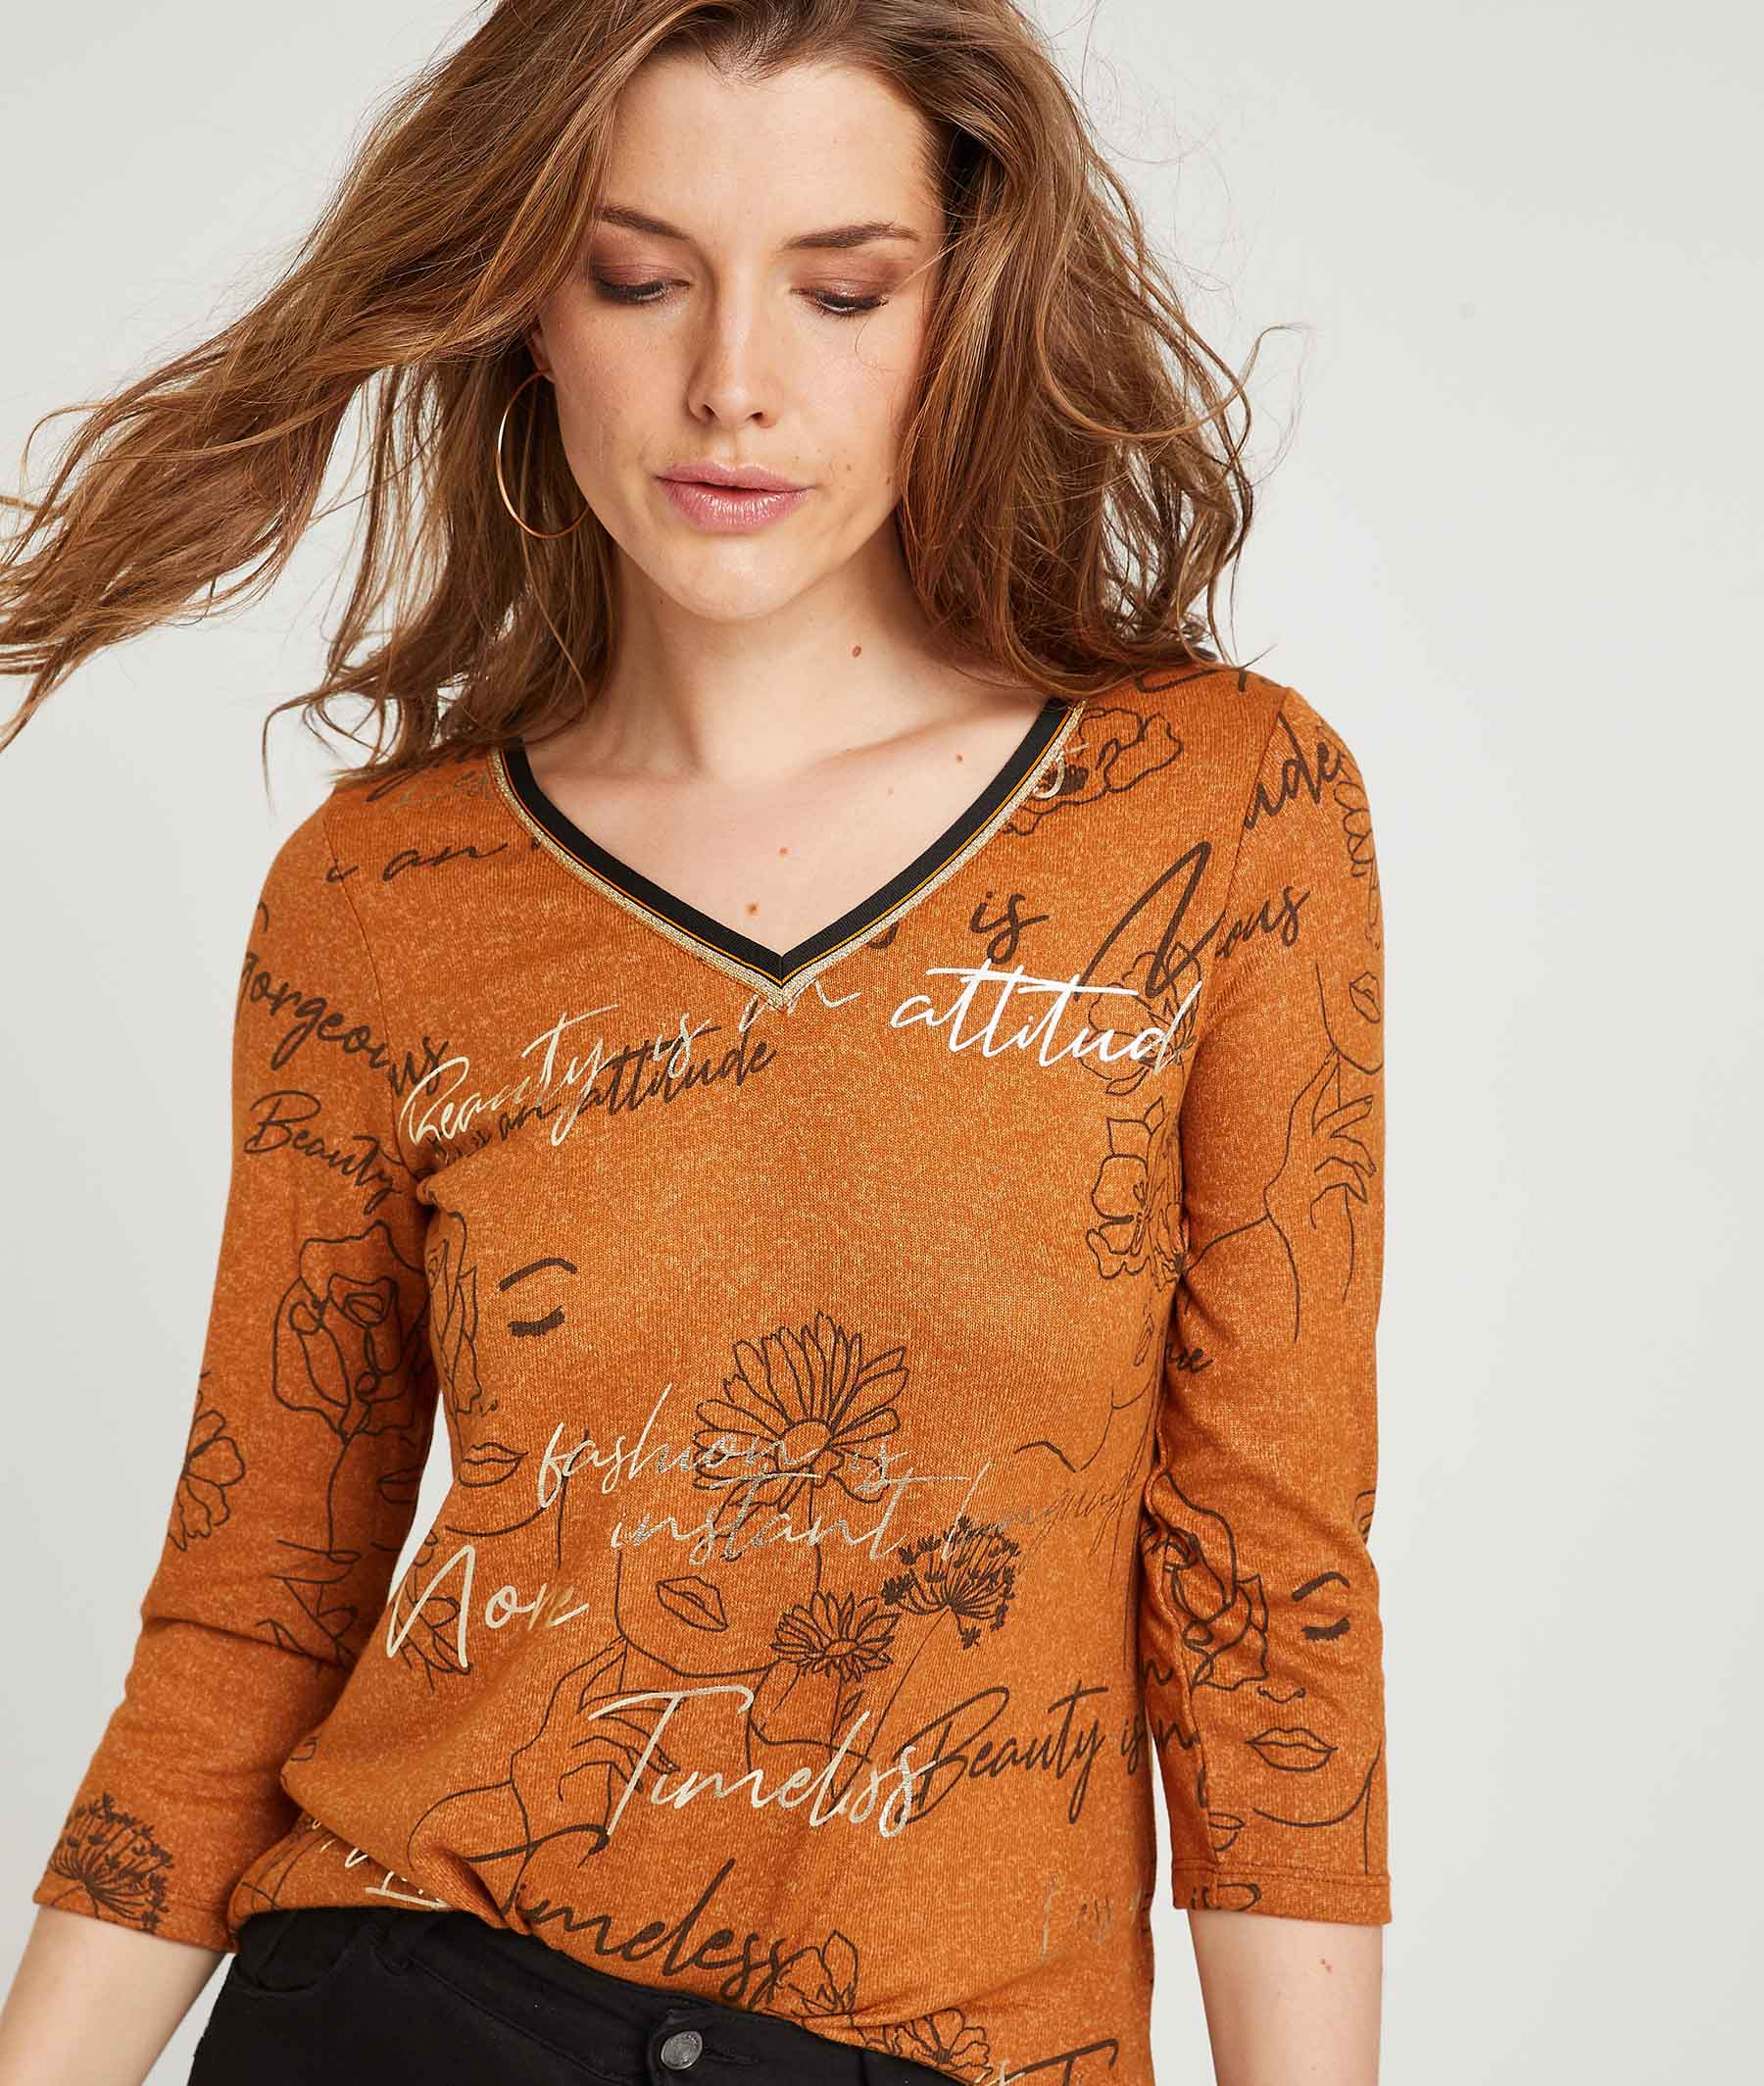 T-shirt avec dessins et textes CARAMEL